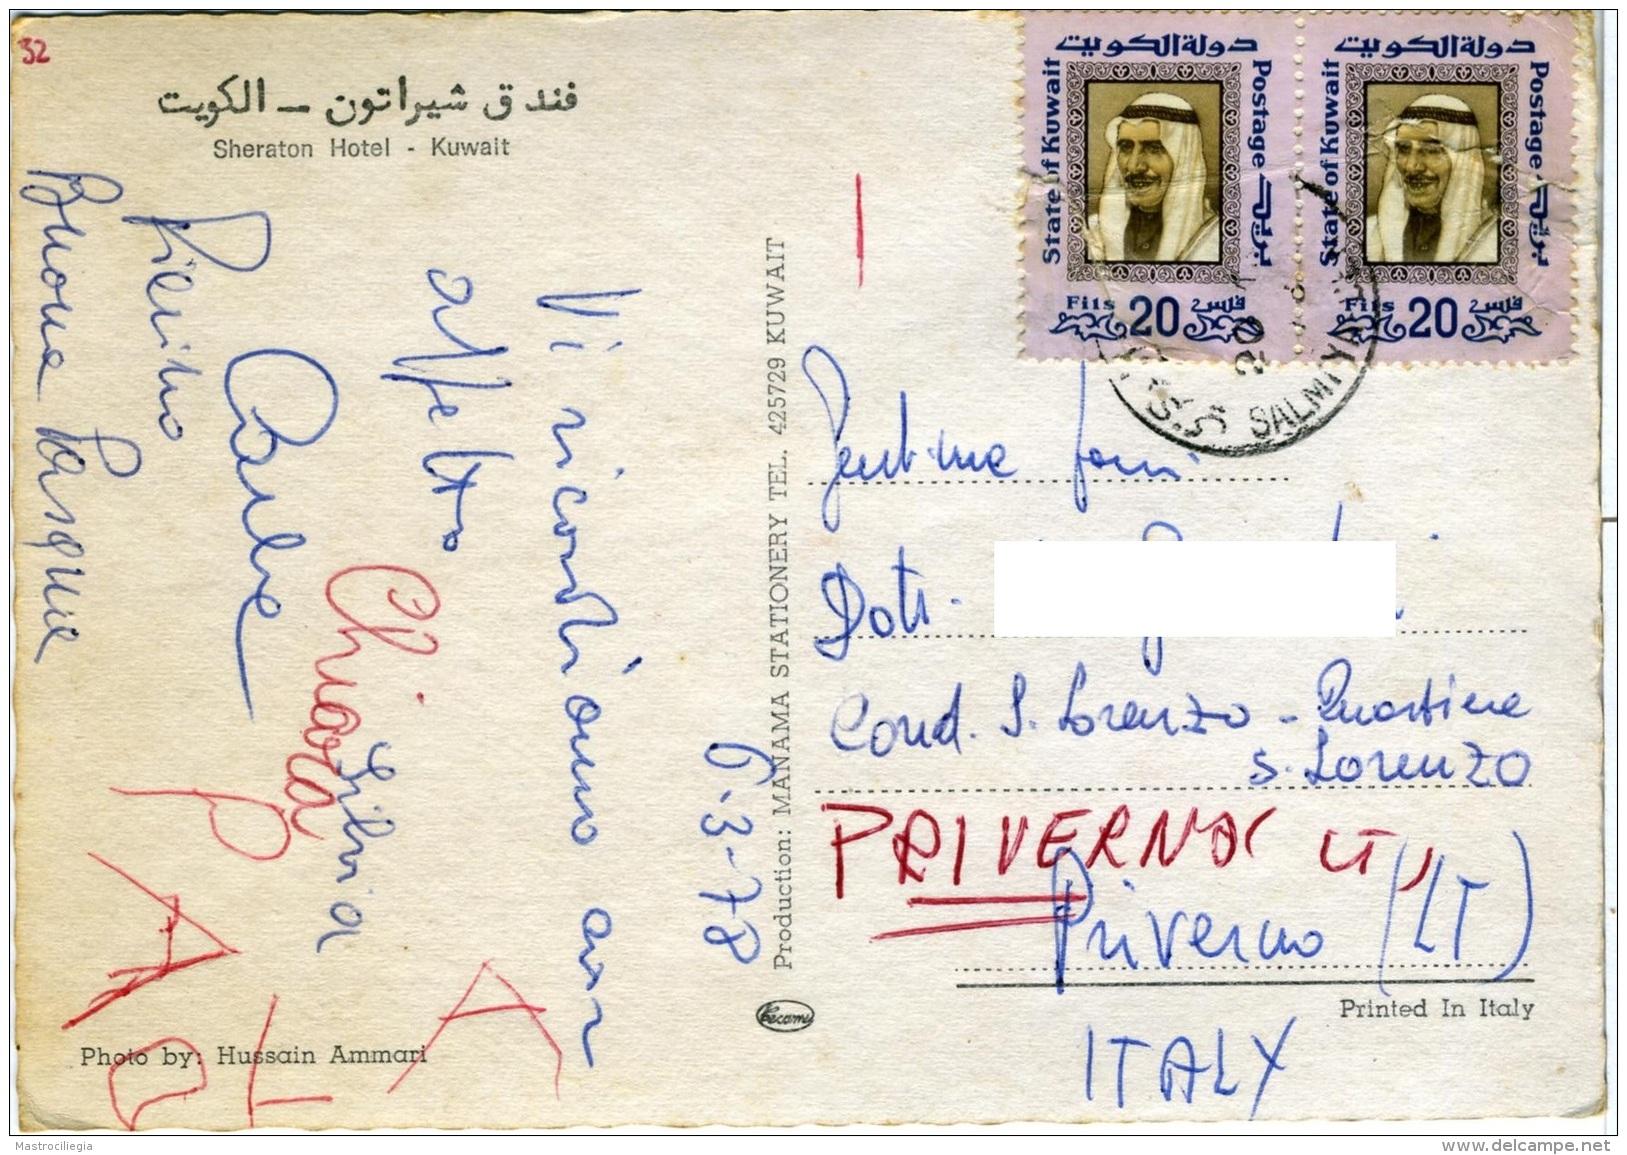 KUWAIT  Sheraton Hotel  Nice Stamps Damaged - Kuwait